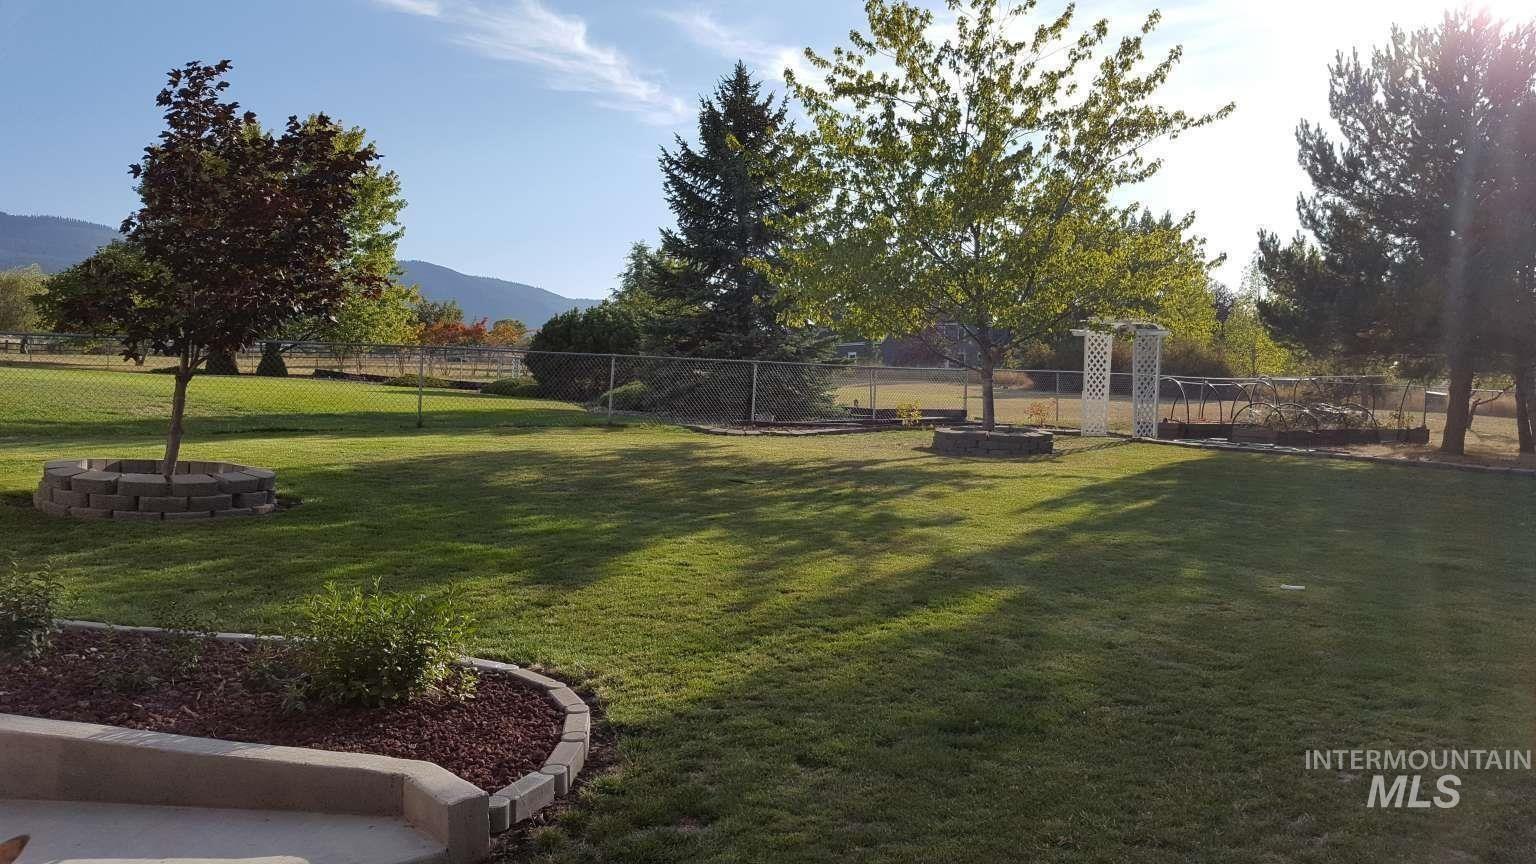 Photo of 502 Park St, Grangeville, ID 83650 (MLS # 98811594)